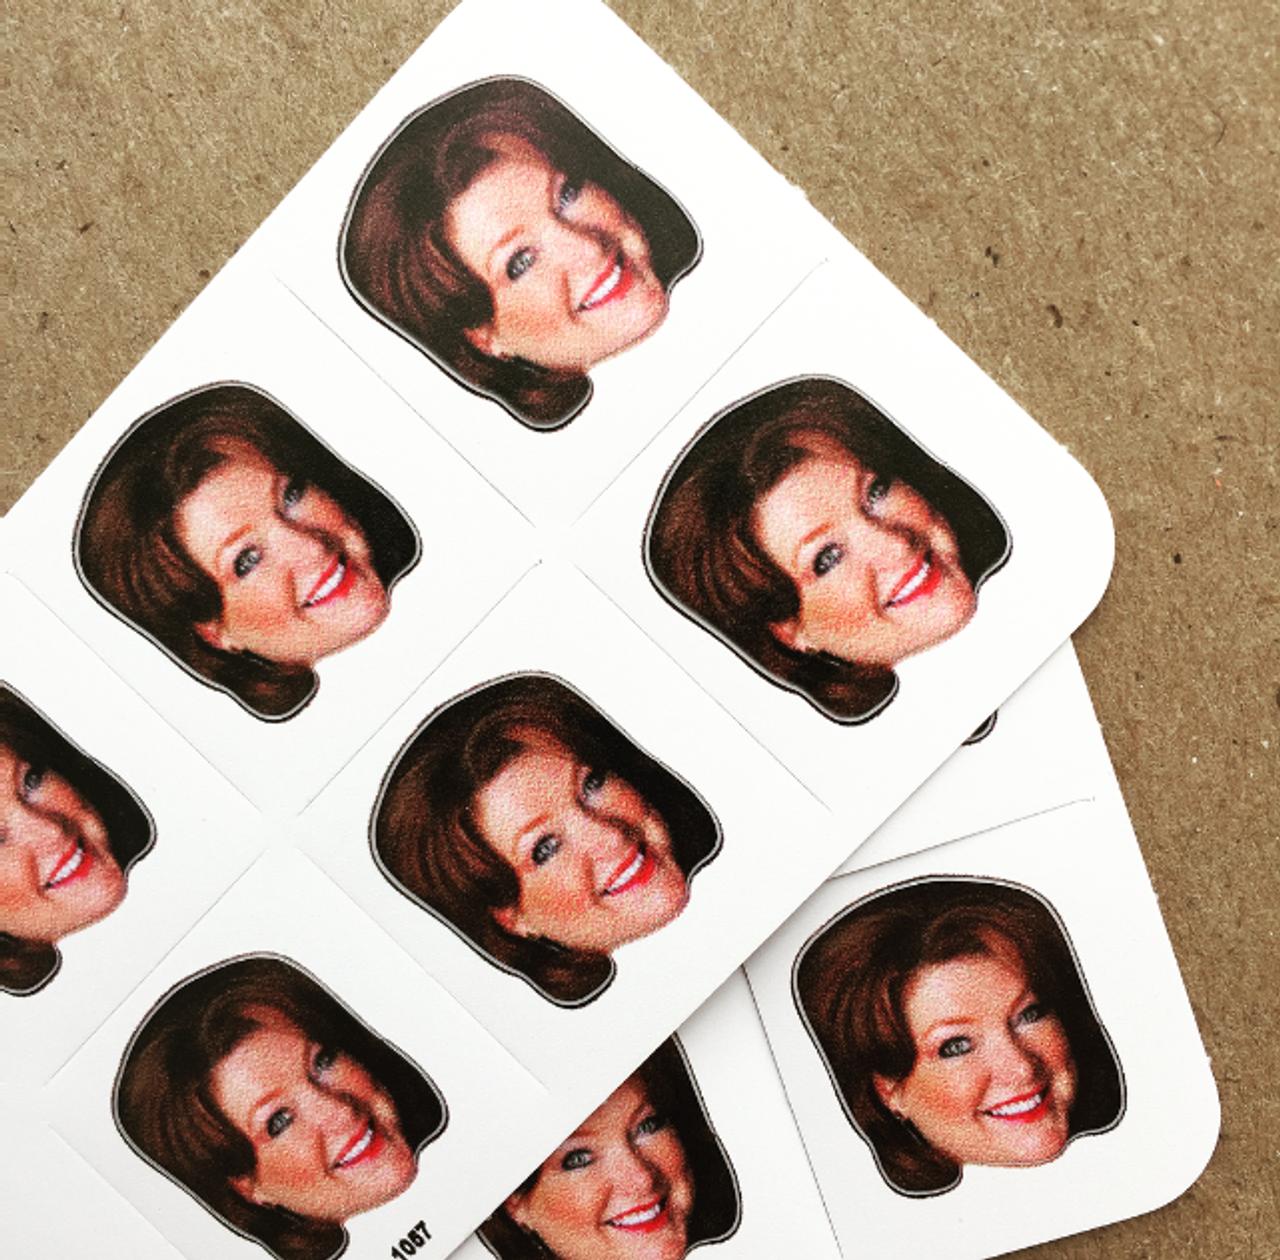 Get to know Sticker Lover, Toni Blake